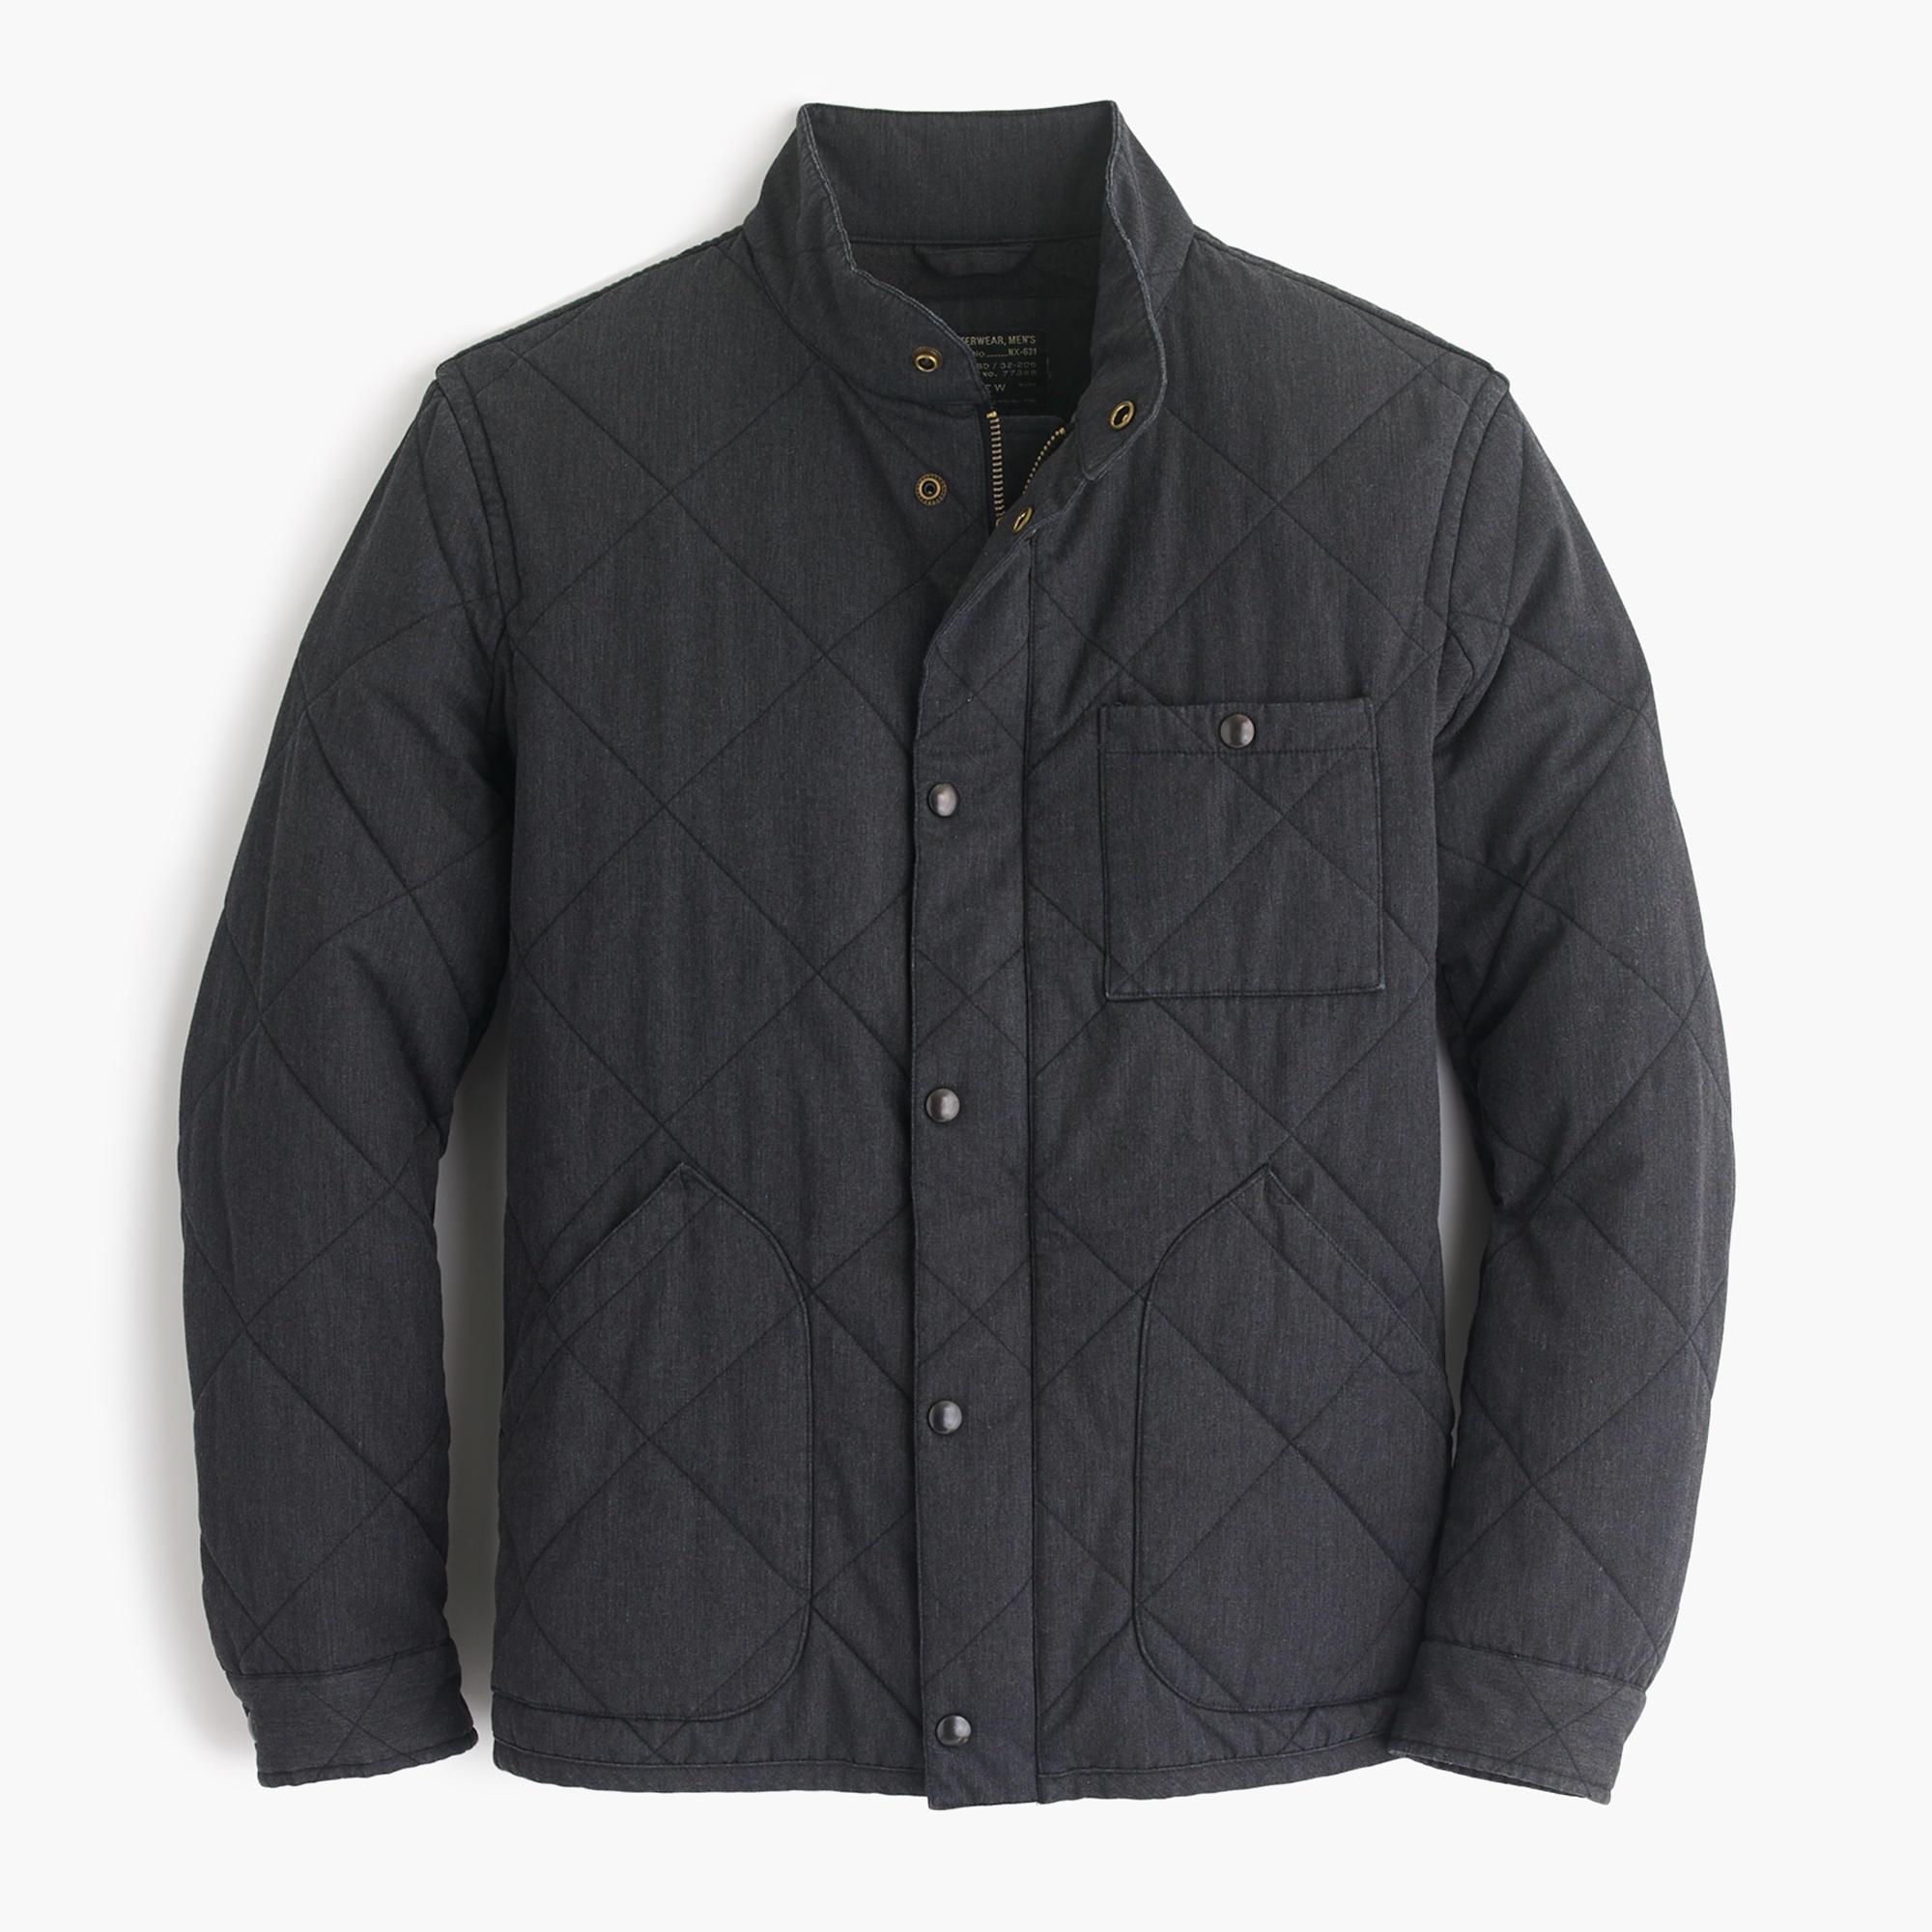 Sussex Quilted Jacket Men S Coats Amp Jackets J Crew